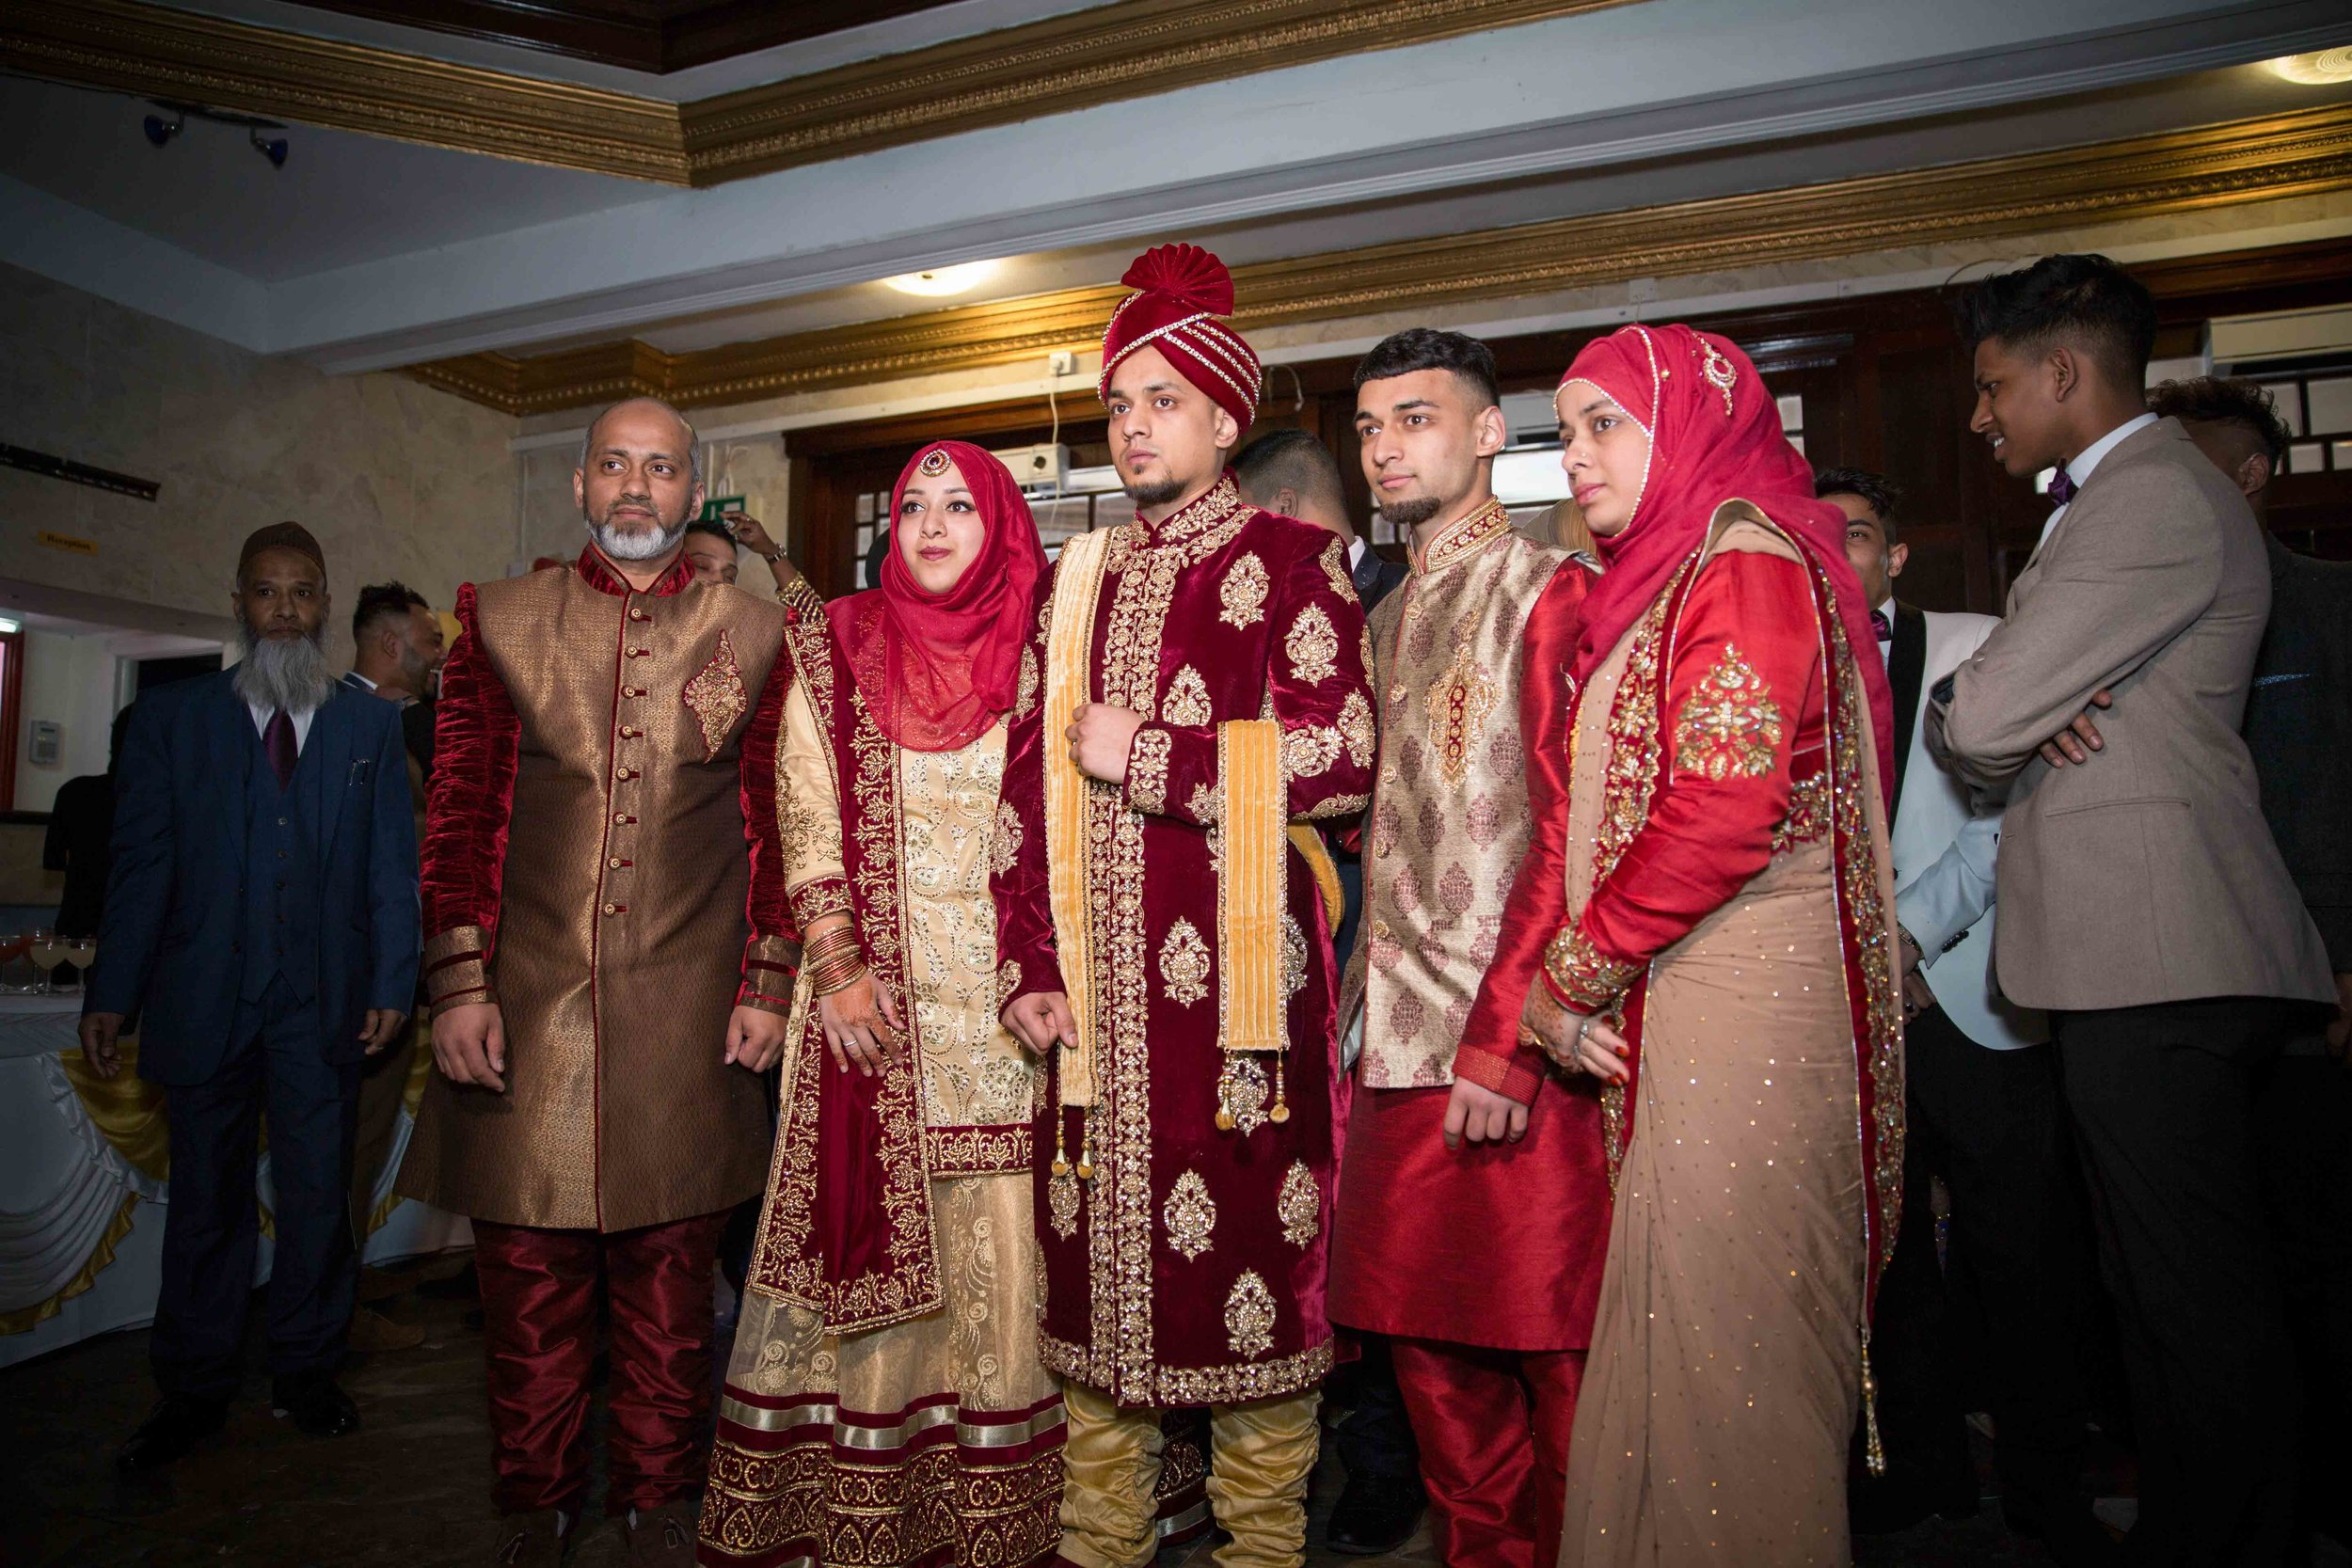 Female-Asian-Piccadilly-banqueting-suite-Wedding-Photographer-Birmingham-natalia-smith-photography-16.jpg